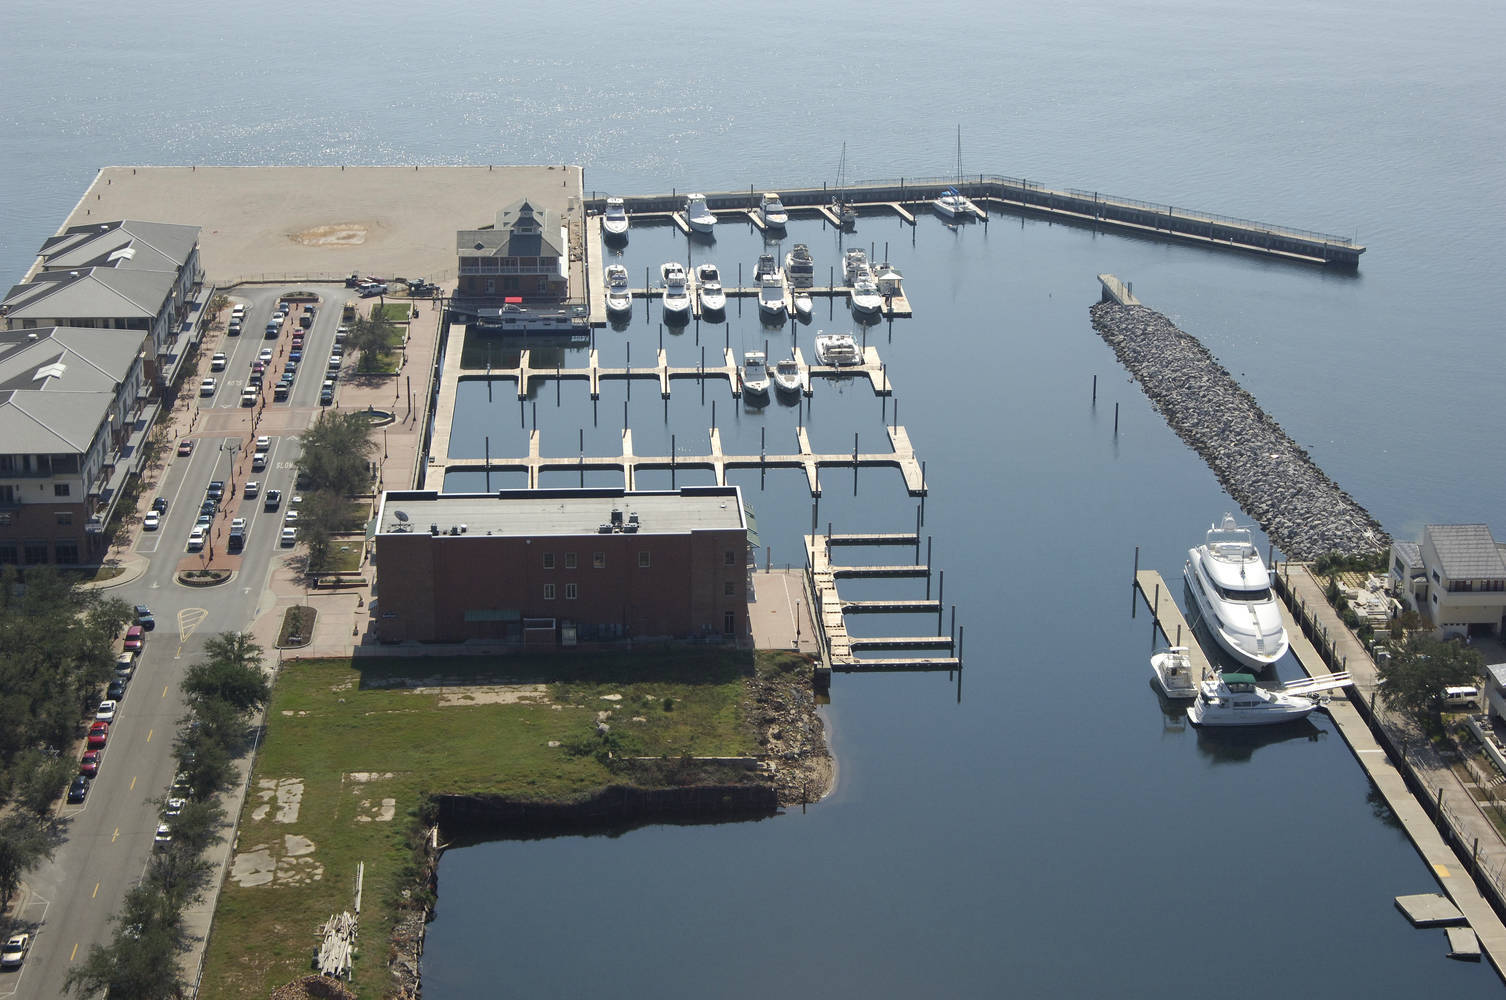 Palafox Pier Amp Yacht Harbour Marina Slip Dock Mooring